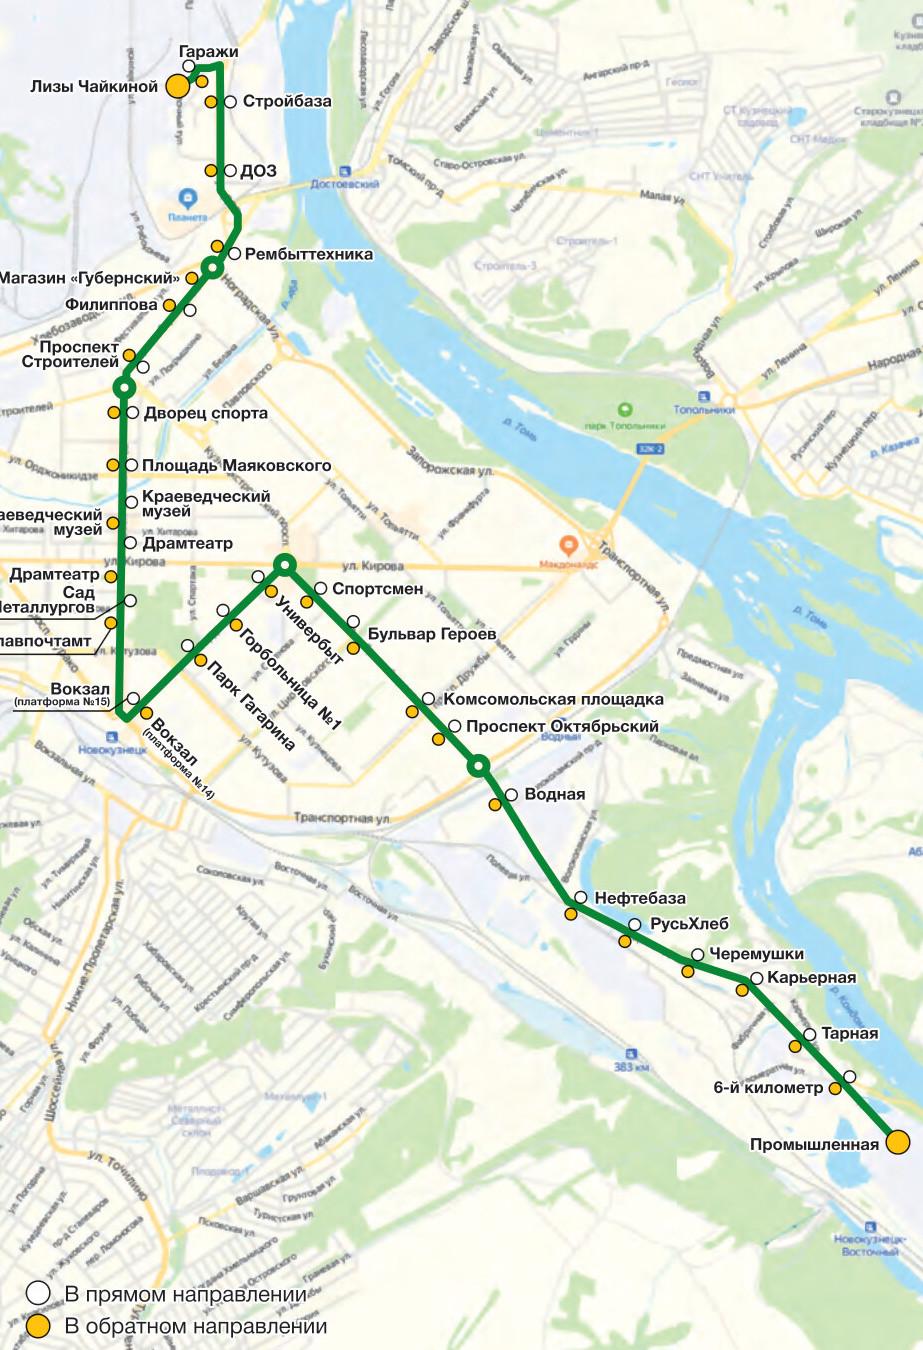 Автобус №66 ЛЕВЫЙ БЕРЕГ - СТРОЙБАЗА | Карта маршрута